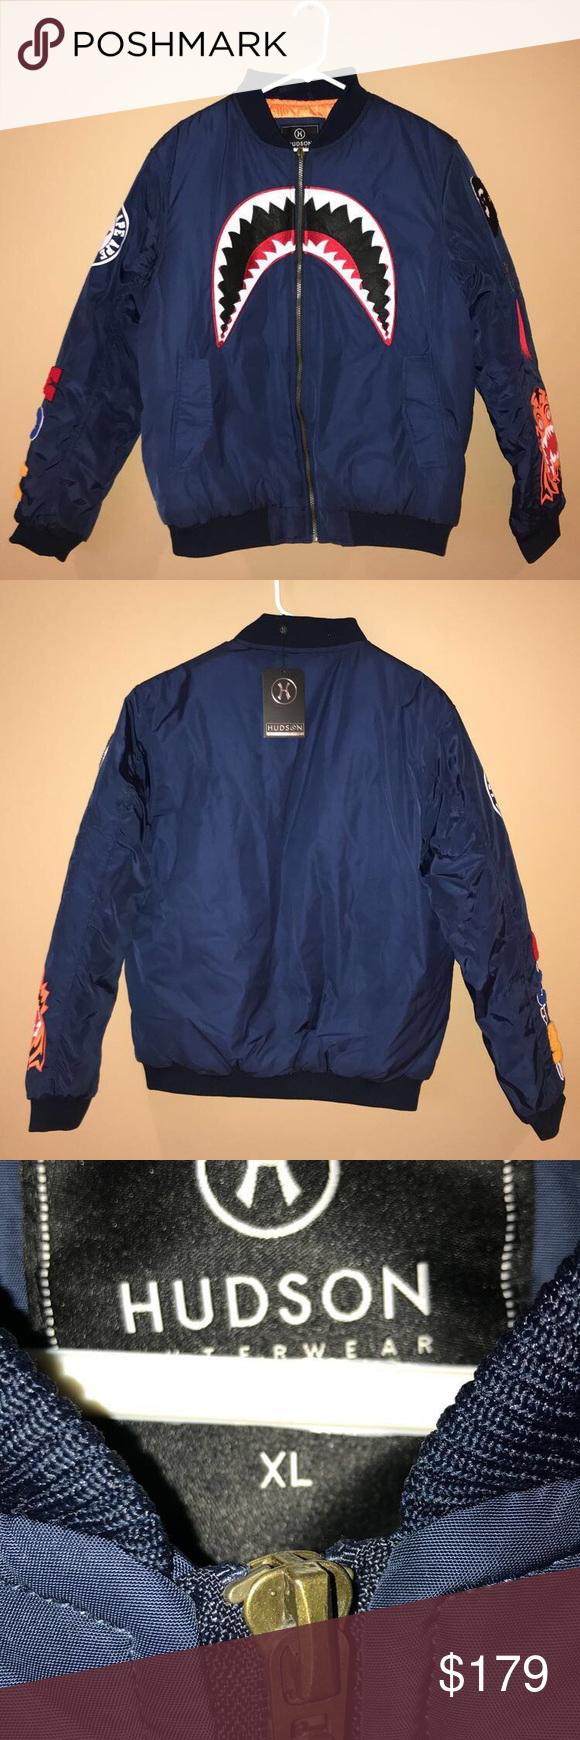 Hudson Outerwear Navy Bomber Xl Bape Supreme Navy Bomber Outerwear Outerwear Jackets [ 1740 x 580 Pixel ]